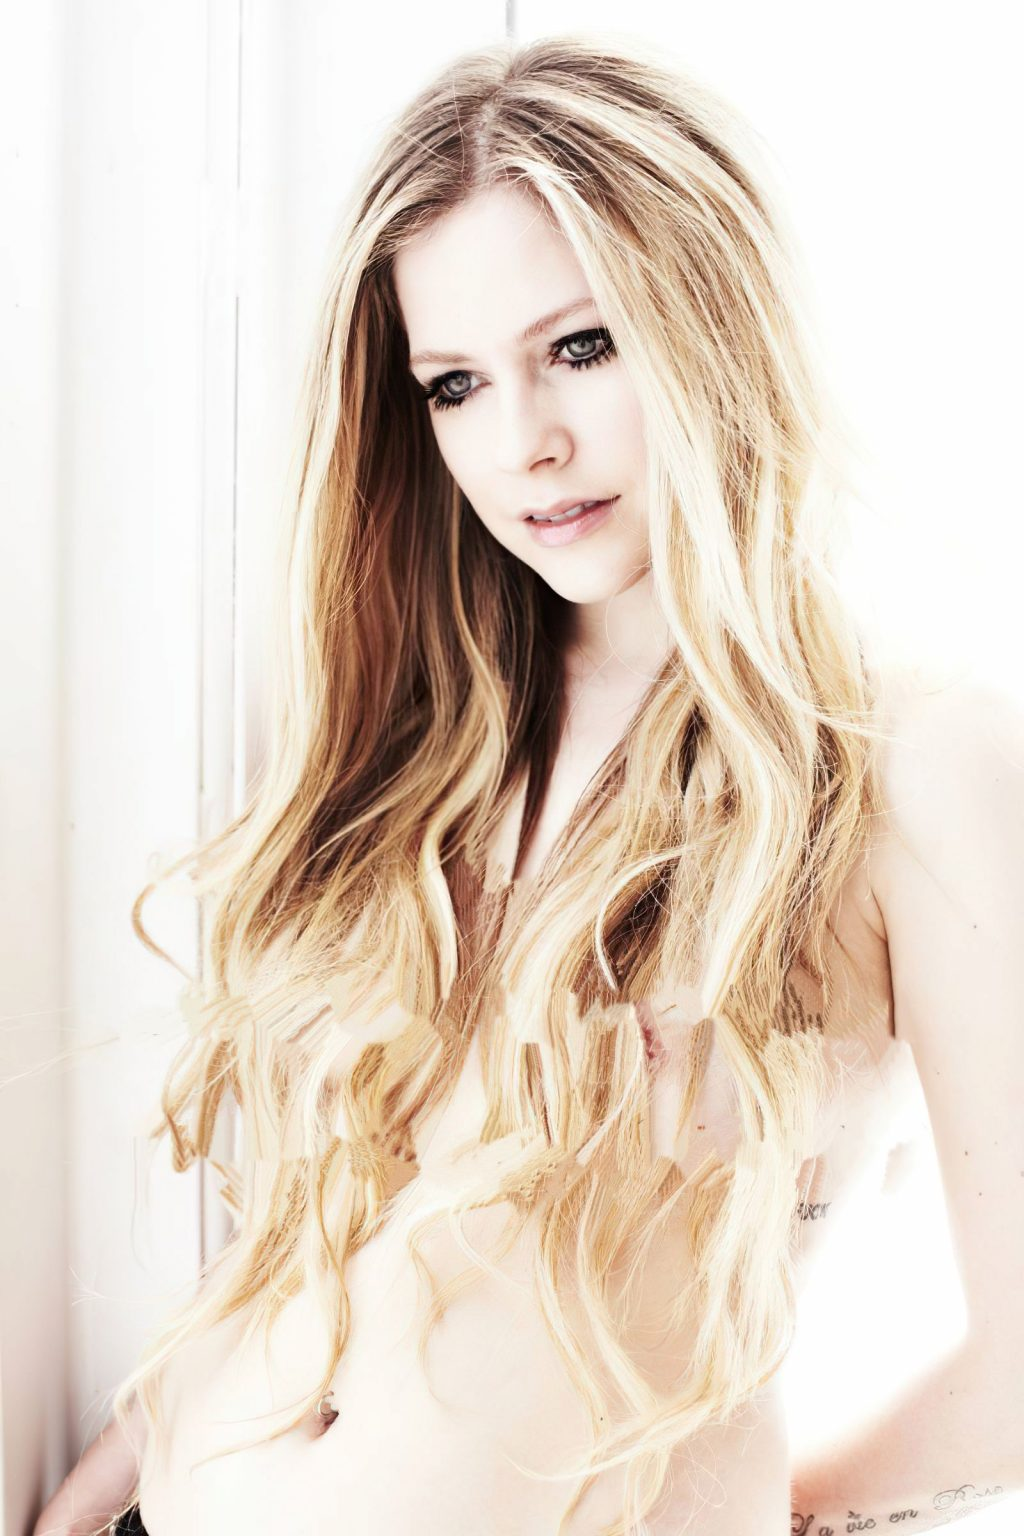 Avril Lavigne Nude & Sexy (7 Photos)